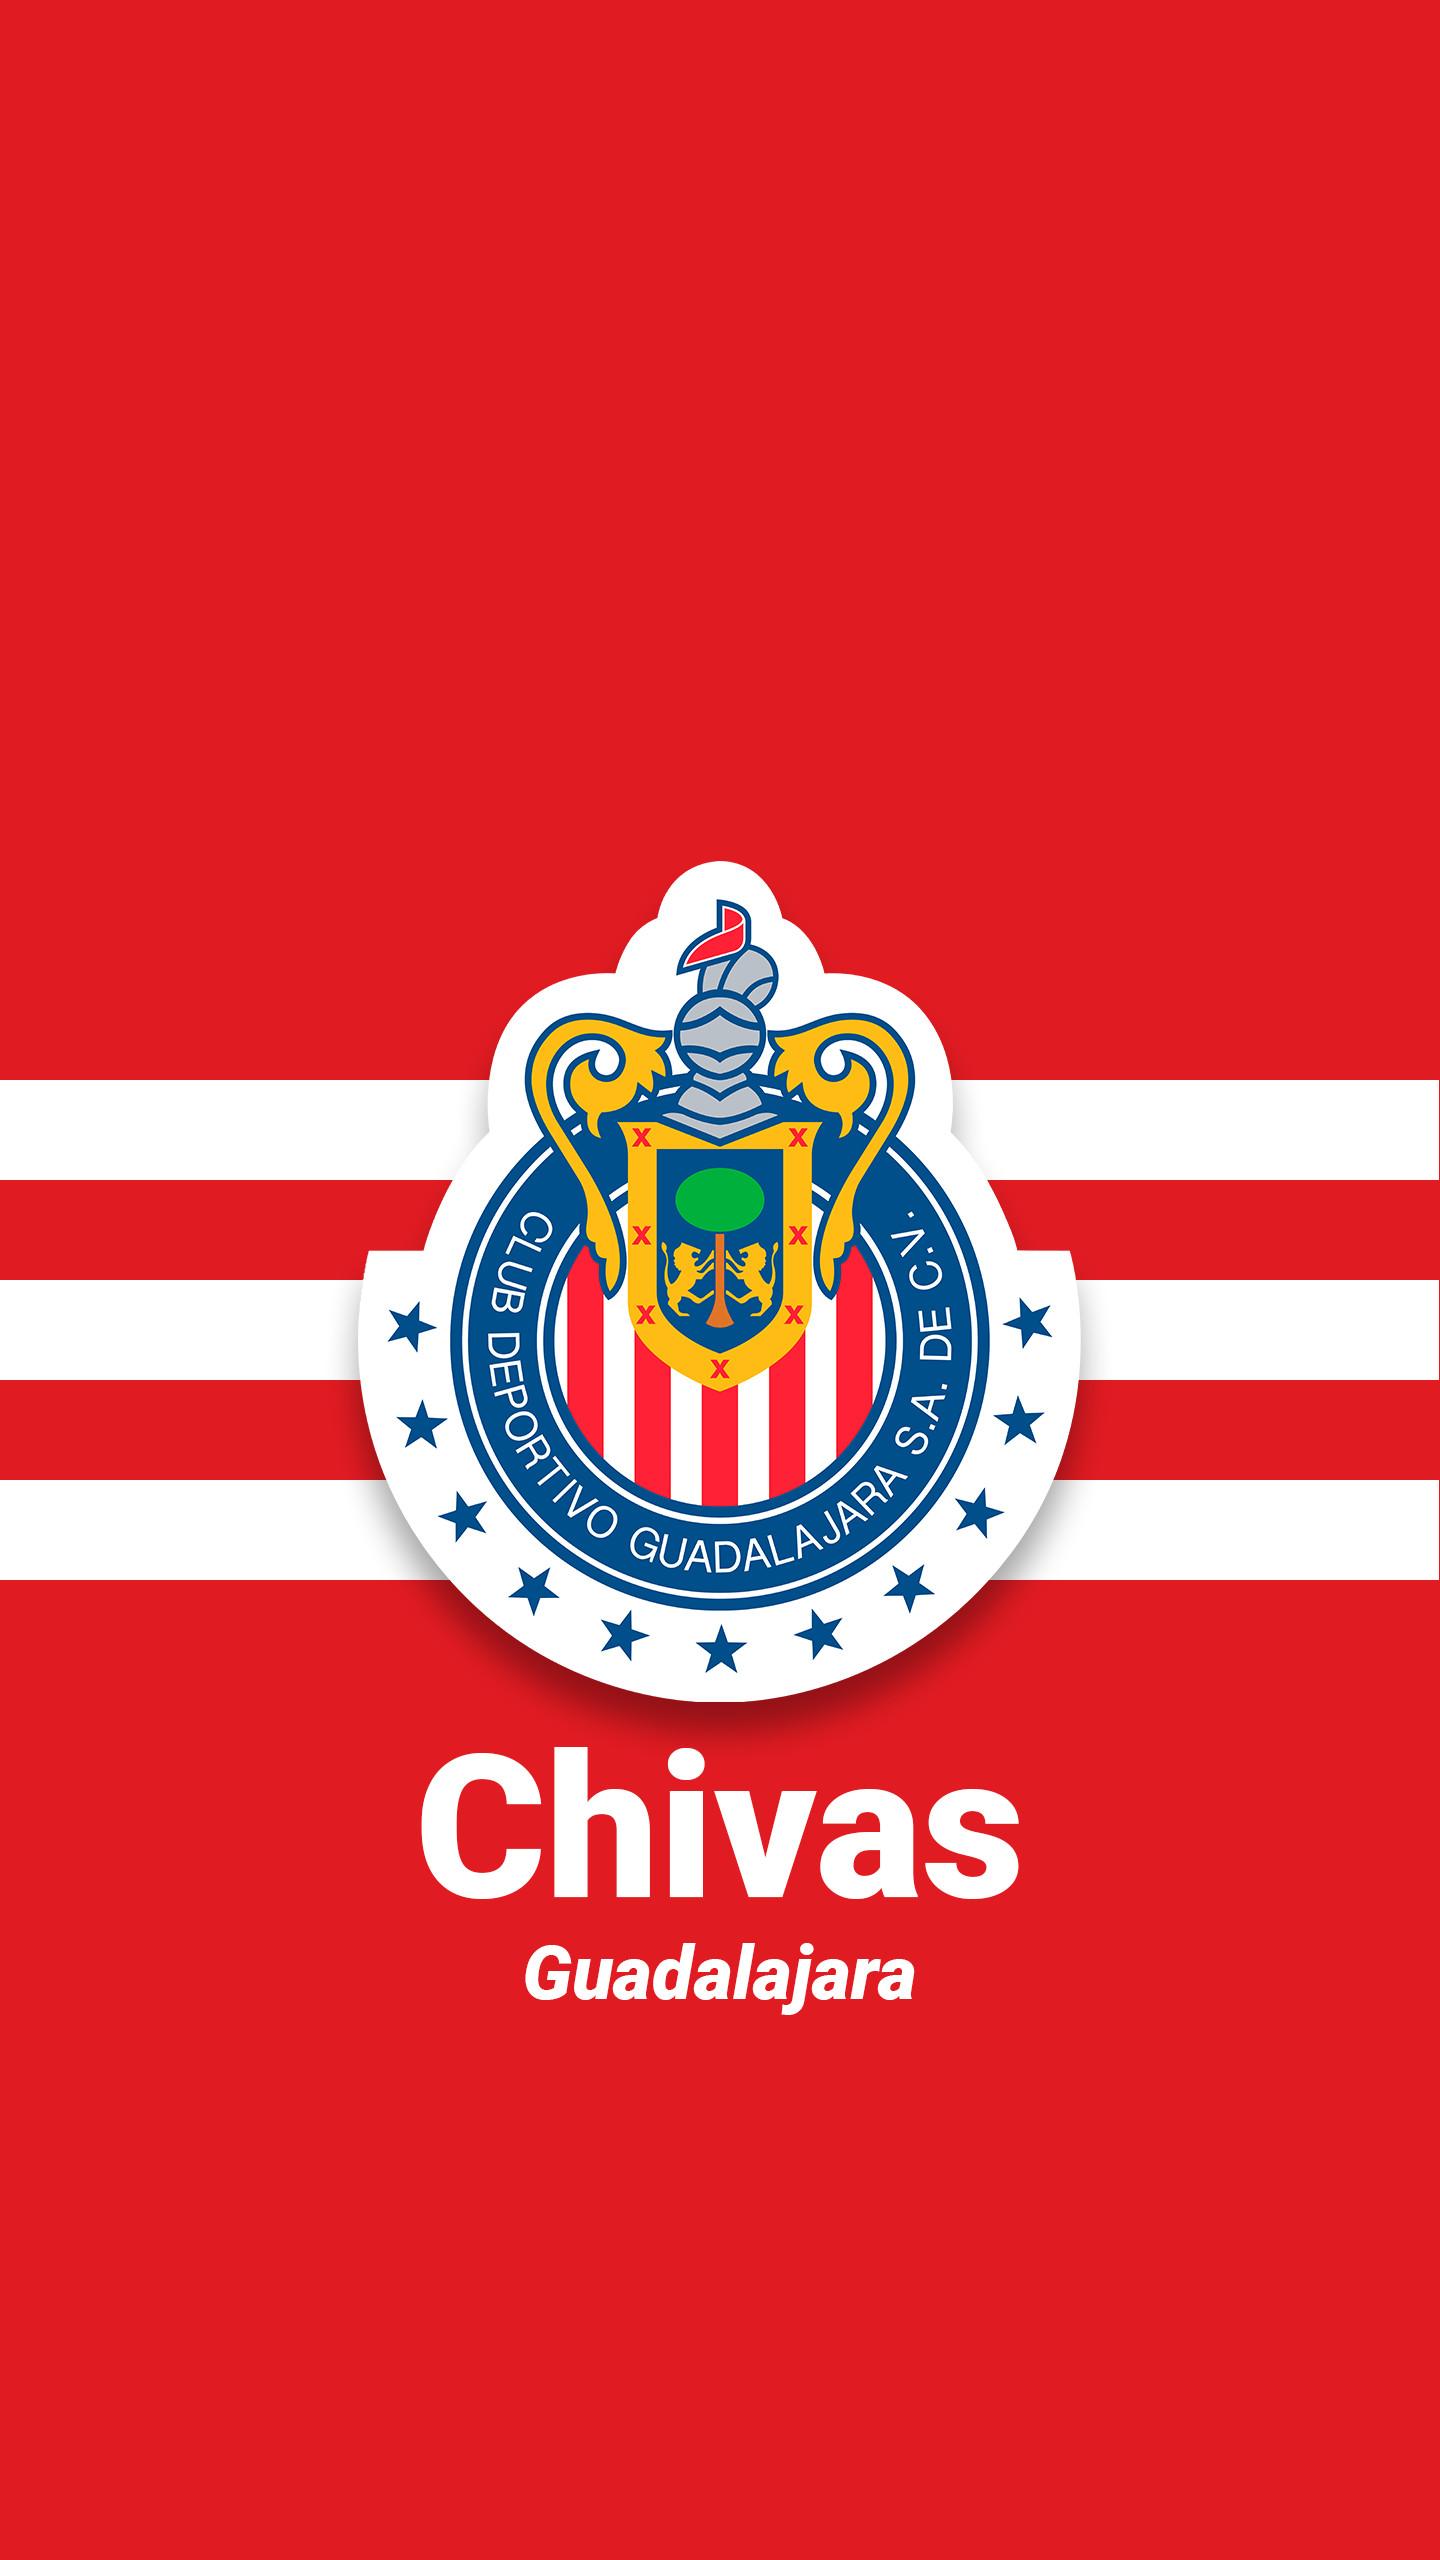 Breitling Logo Wallpaper >> Chivas Wallpaper HD (73+ images)